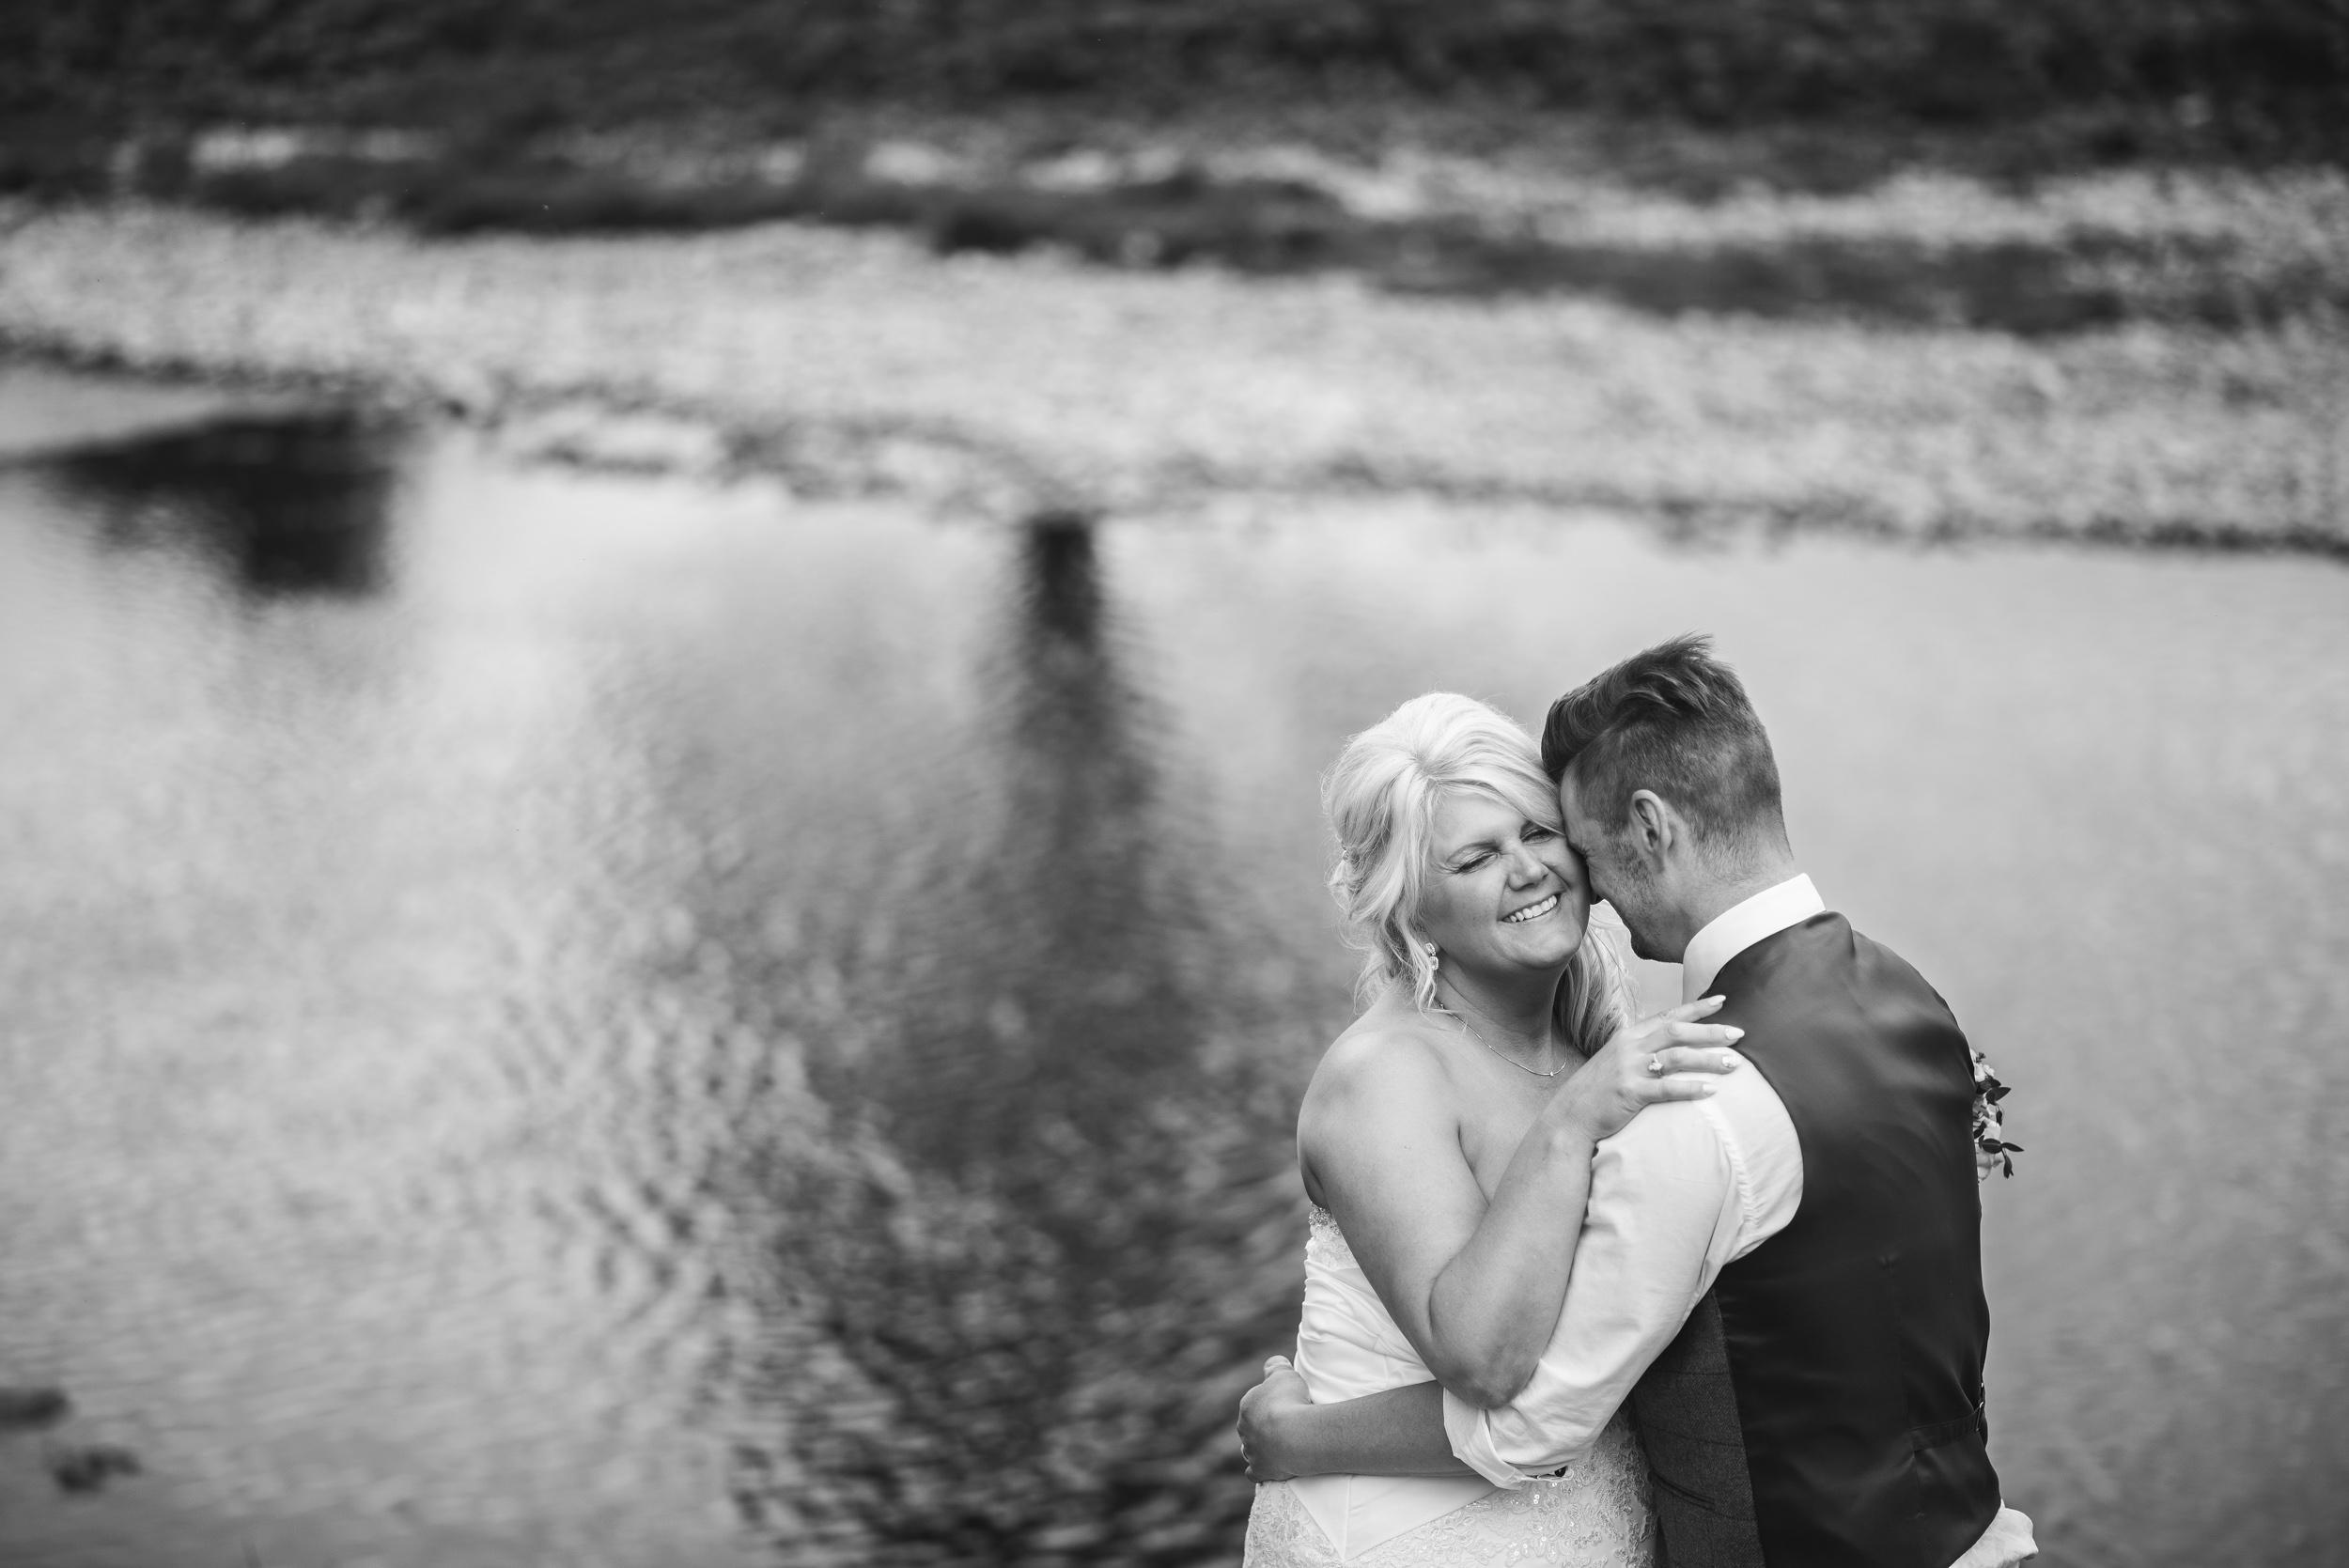 David Scholes Lancashire wedding photography 2016-99.jpg